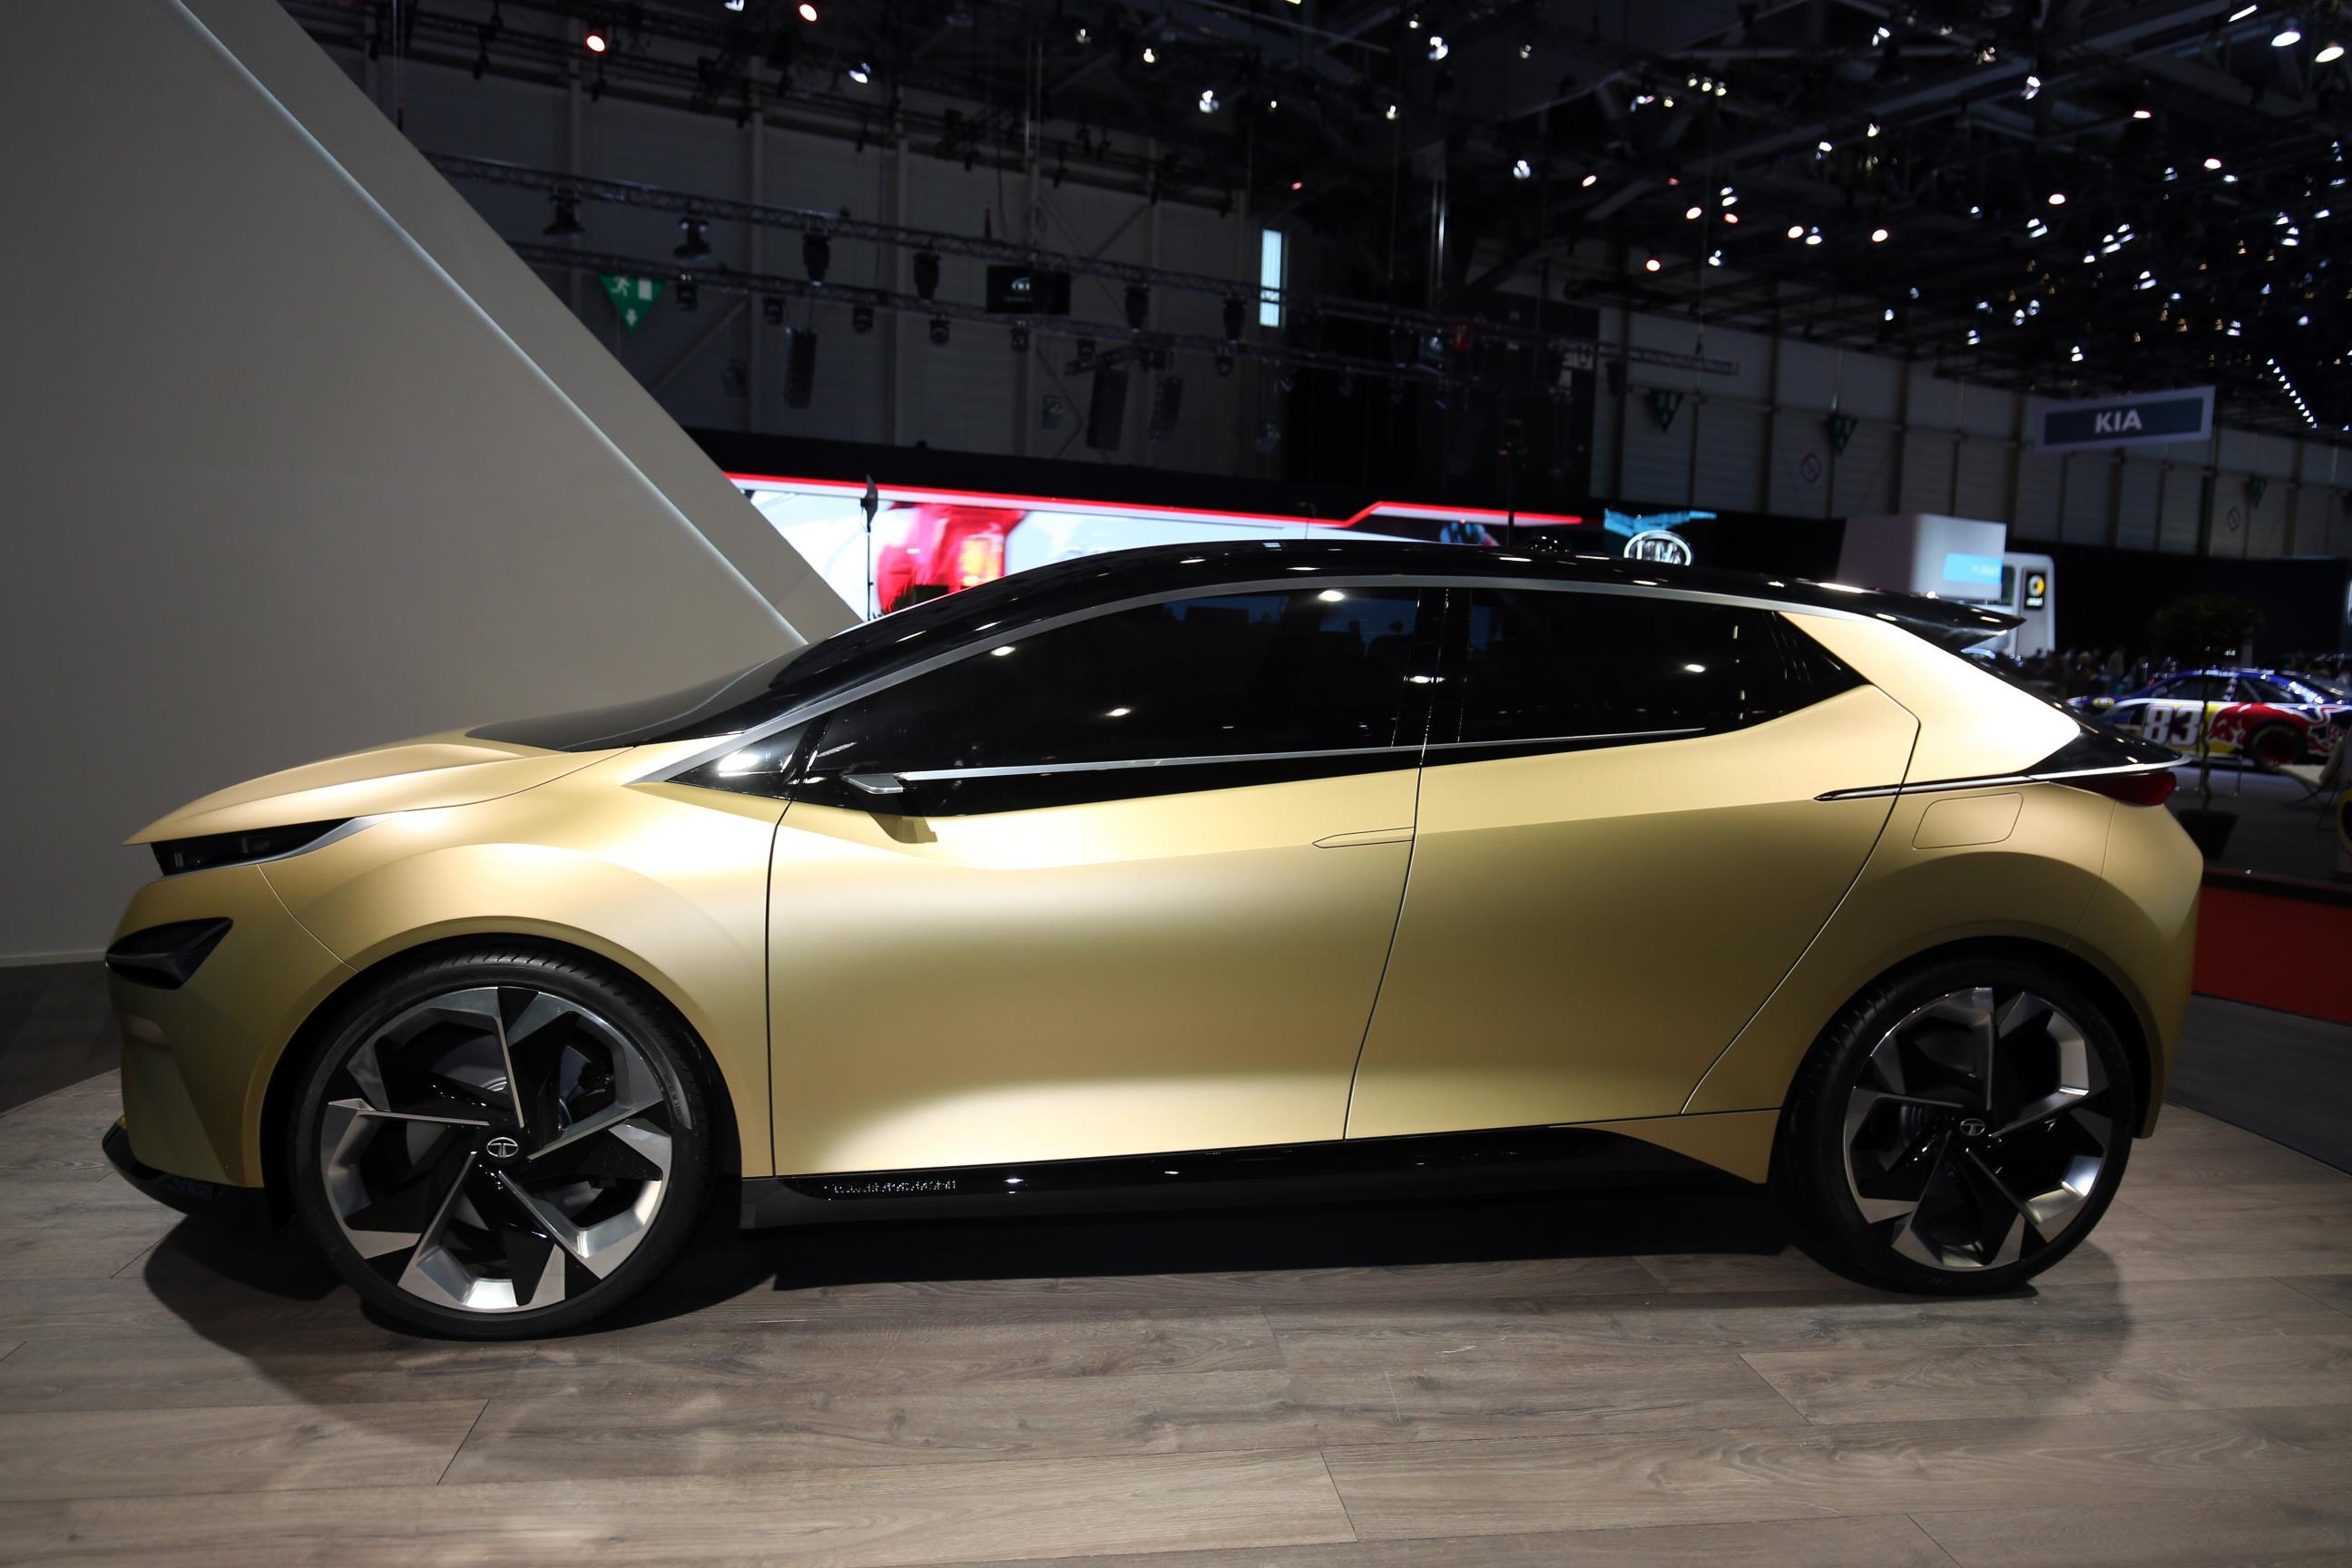 Geneva Motor Show 2018 Mega Gallery Part 2 (180)